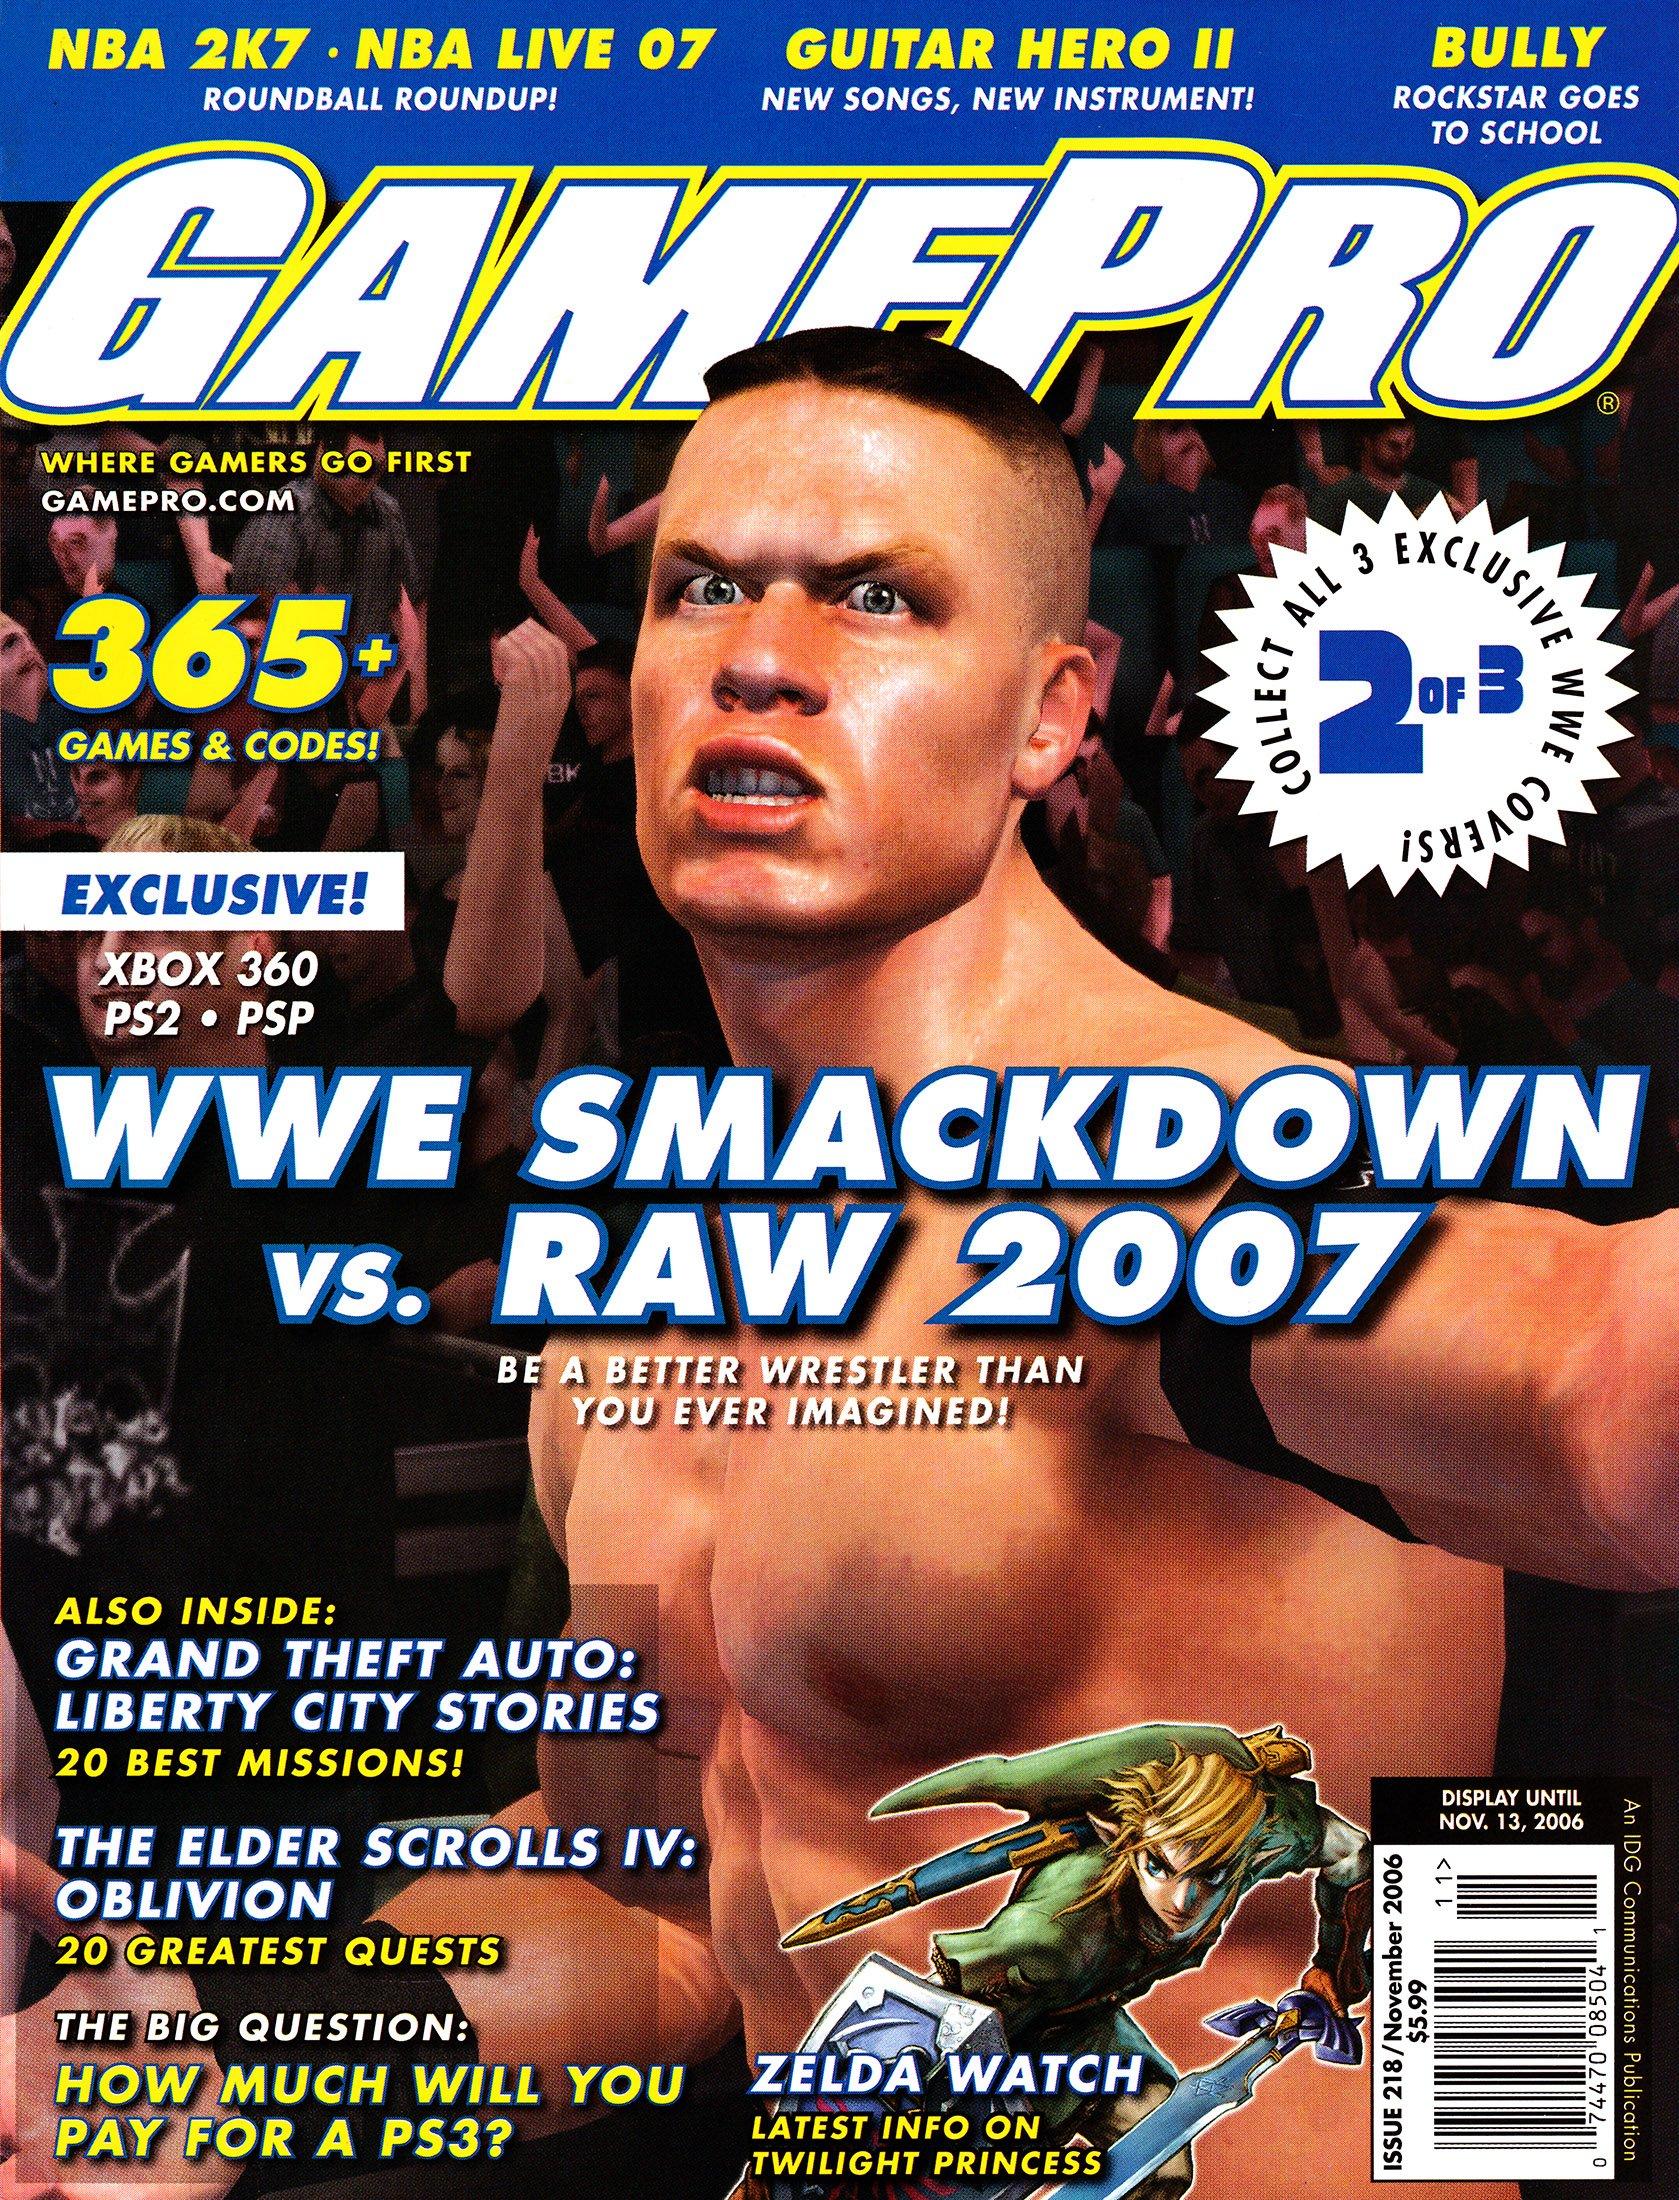 GamePro Issue 218 November 2006 (Cover 2 of 3)